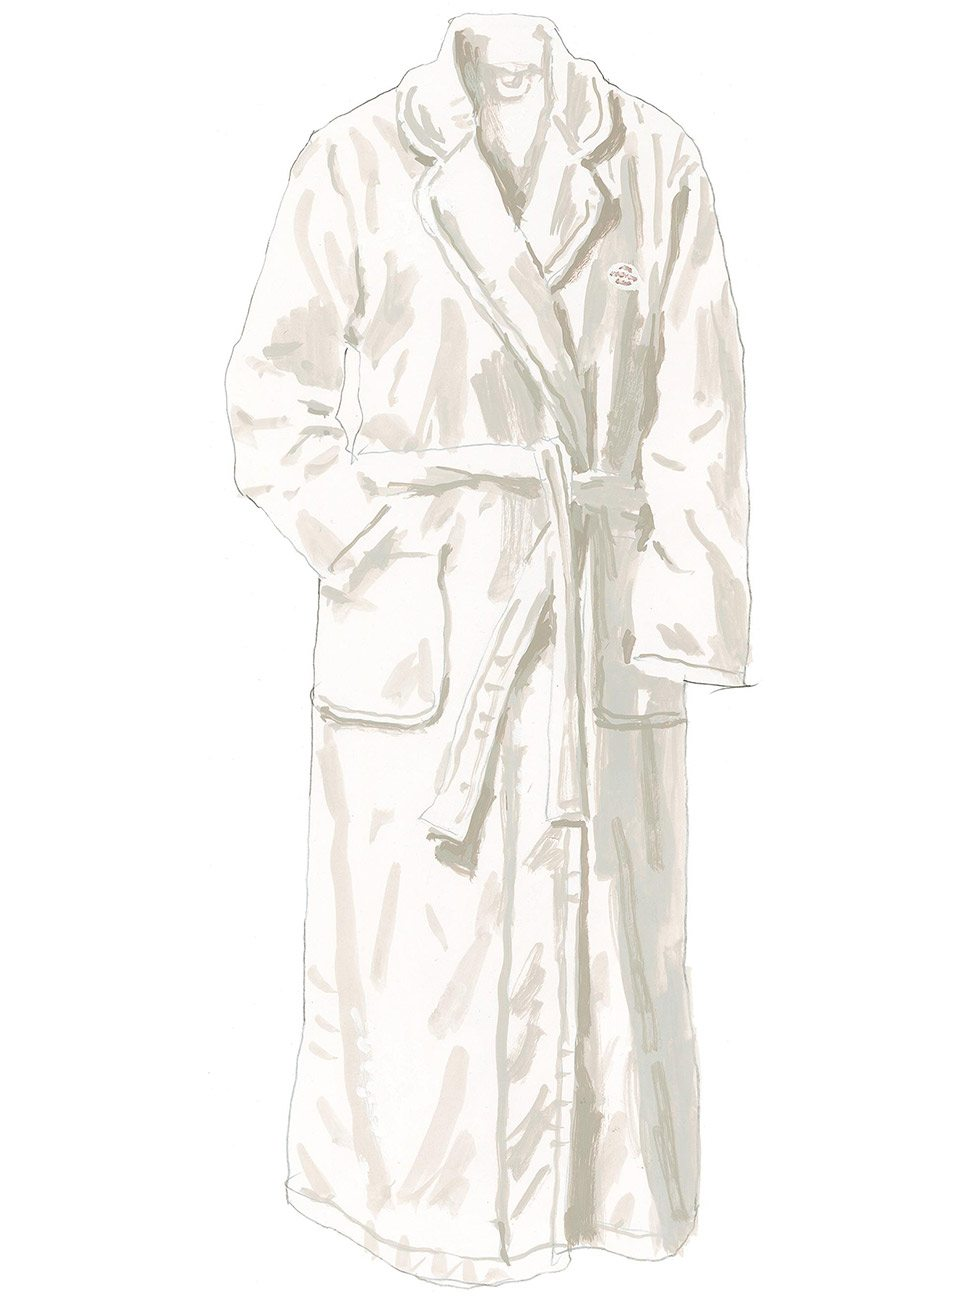 6a95a7dd3f The Shepheard s Hotel Cairo robe from The J. Peterman Company.